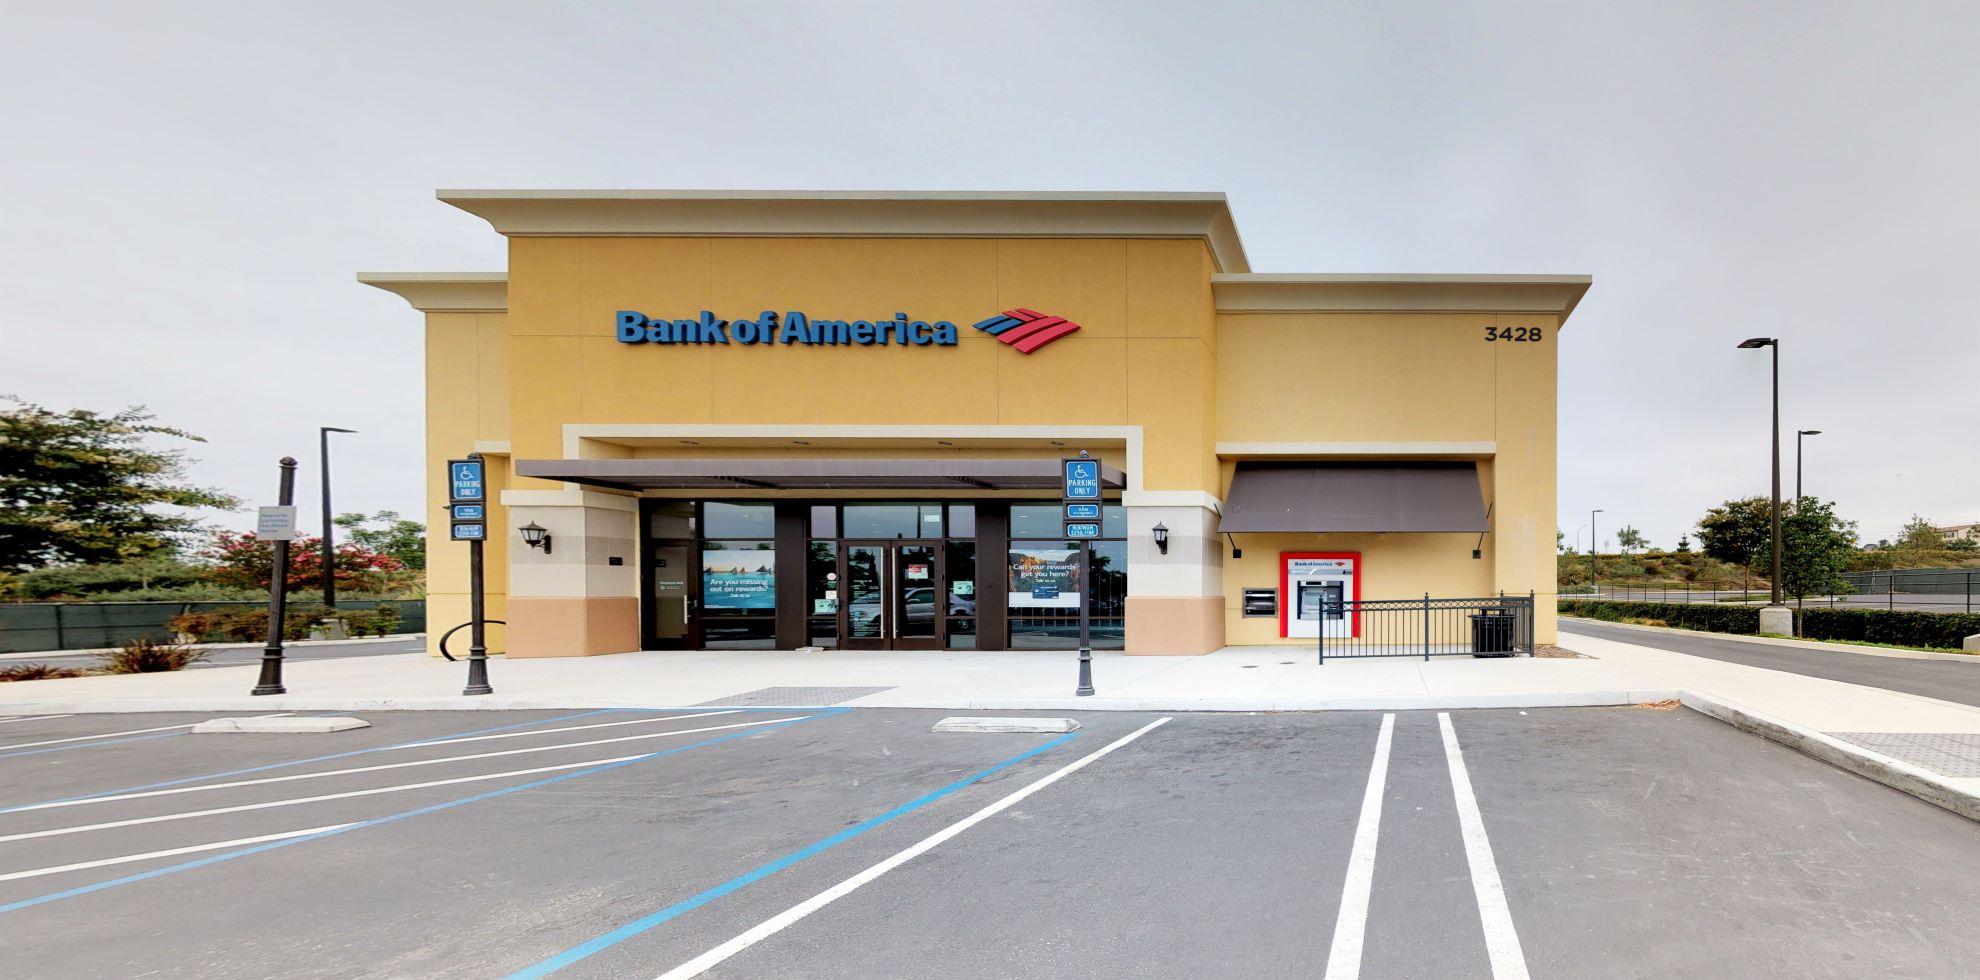 Bank of America financial center with drive-thru ATM | 3428 Via Mercato, Carlsbad, CA 92009